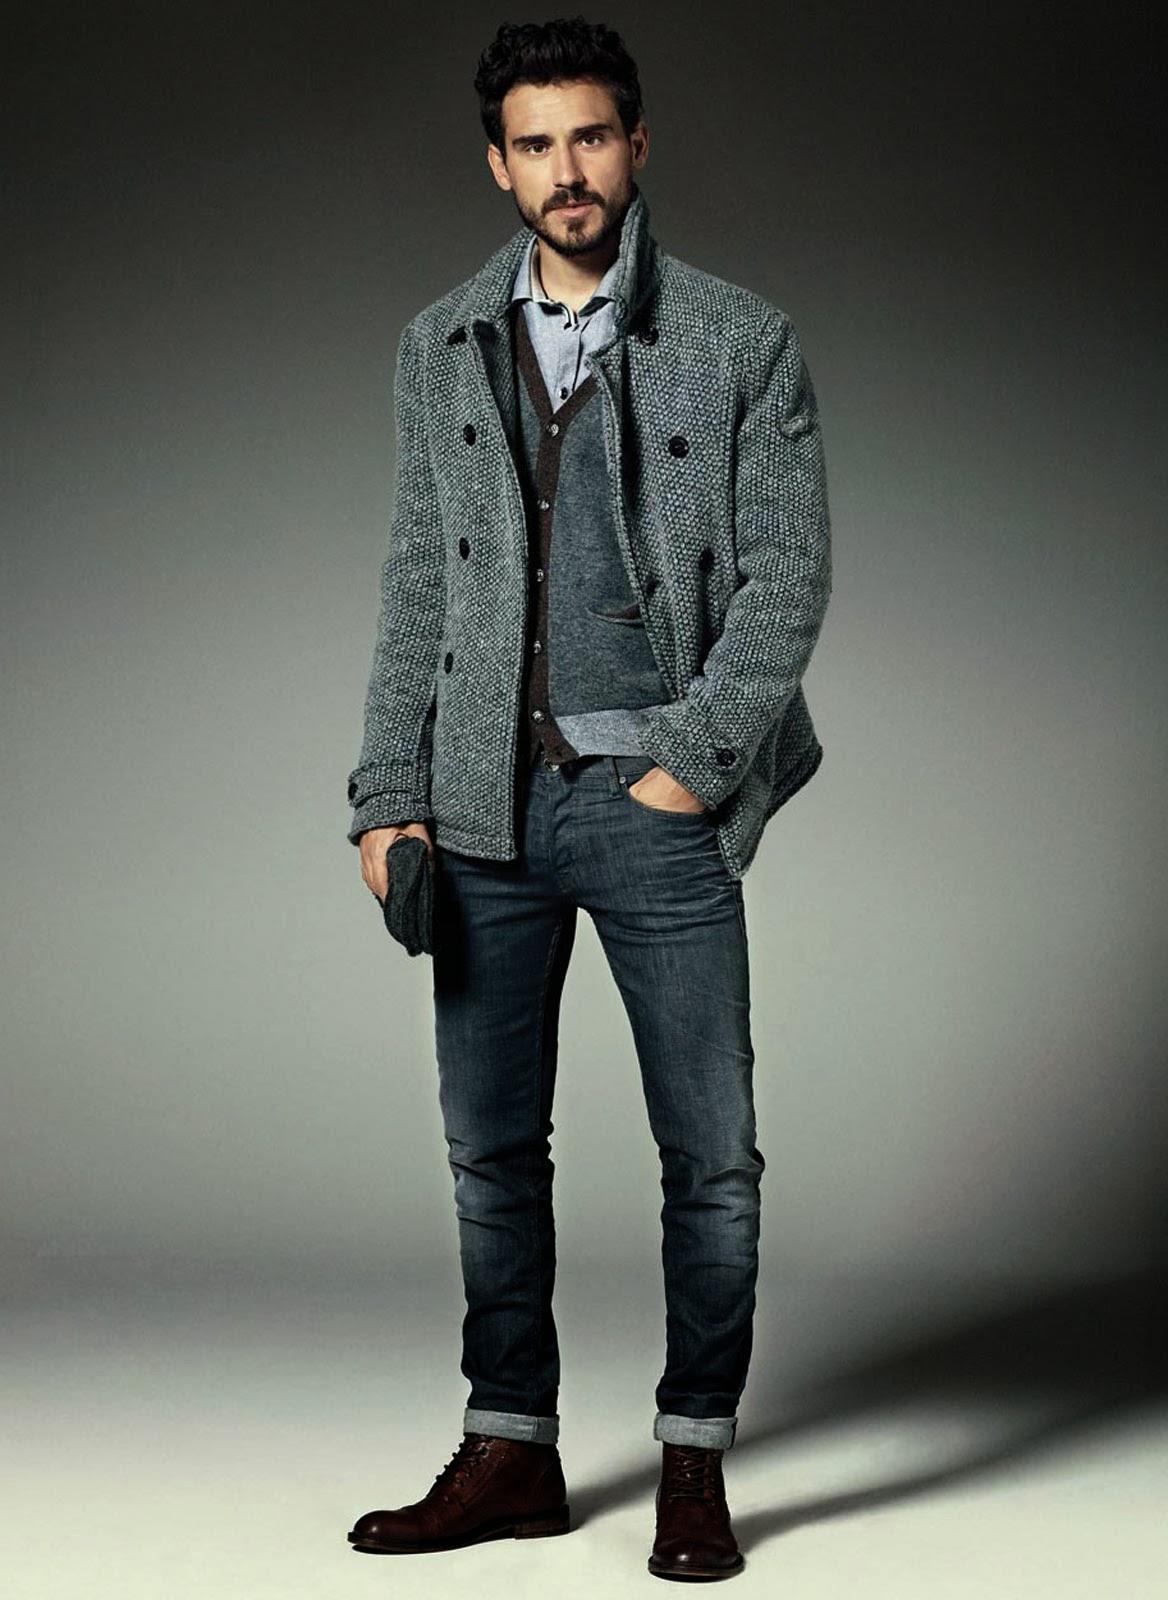 Male Flamboyant Fashion Model